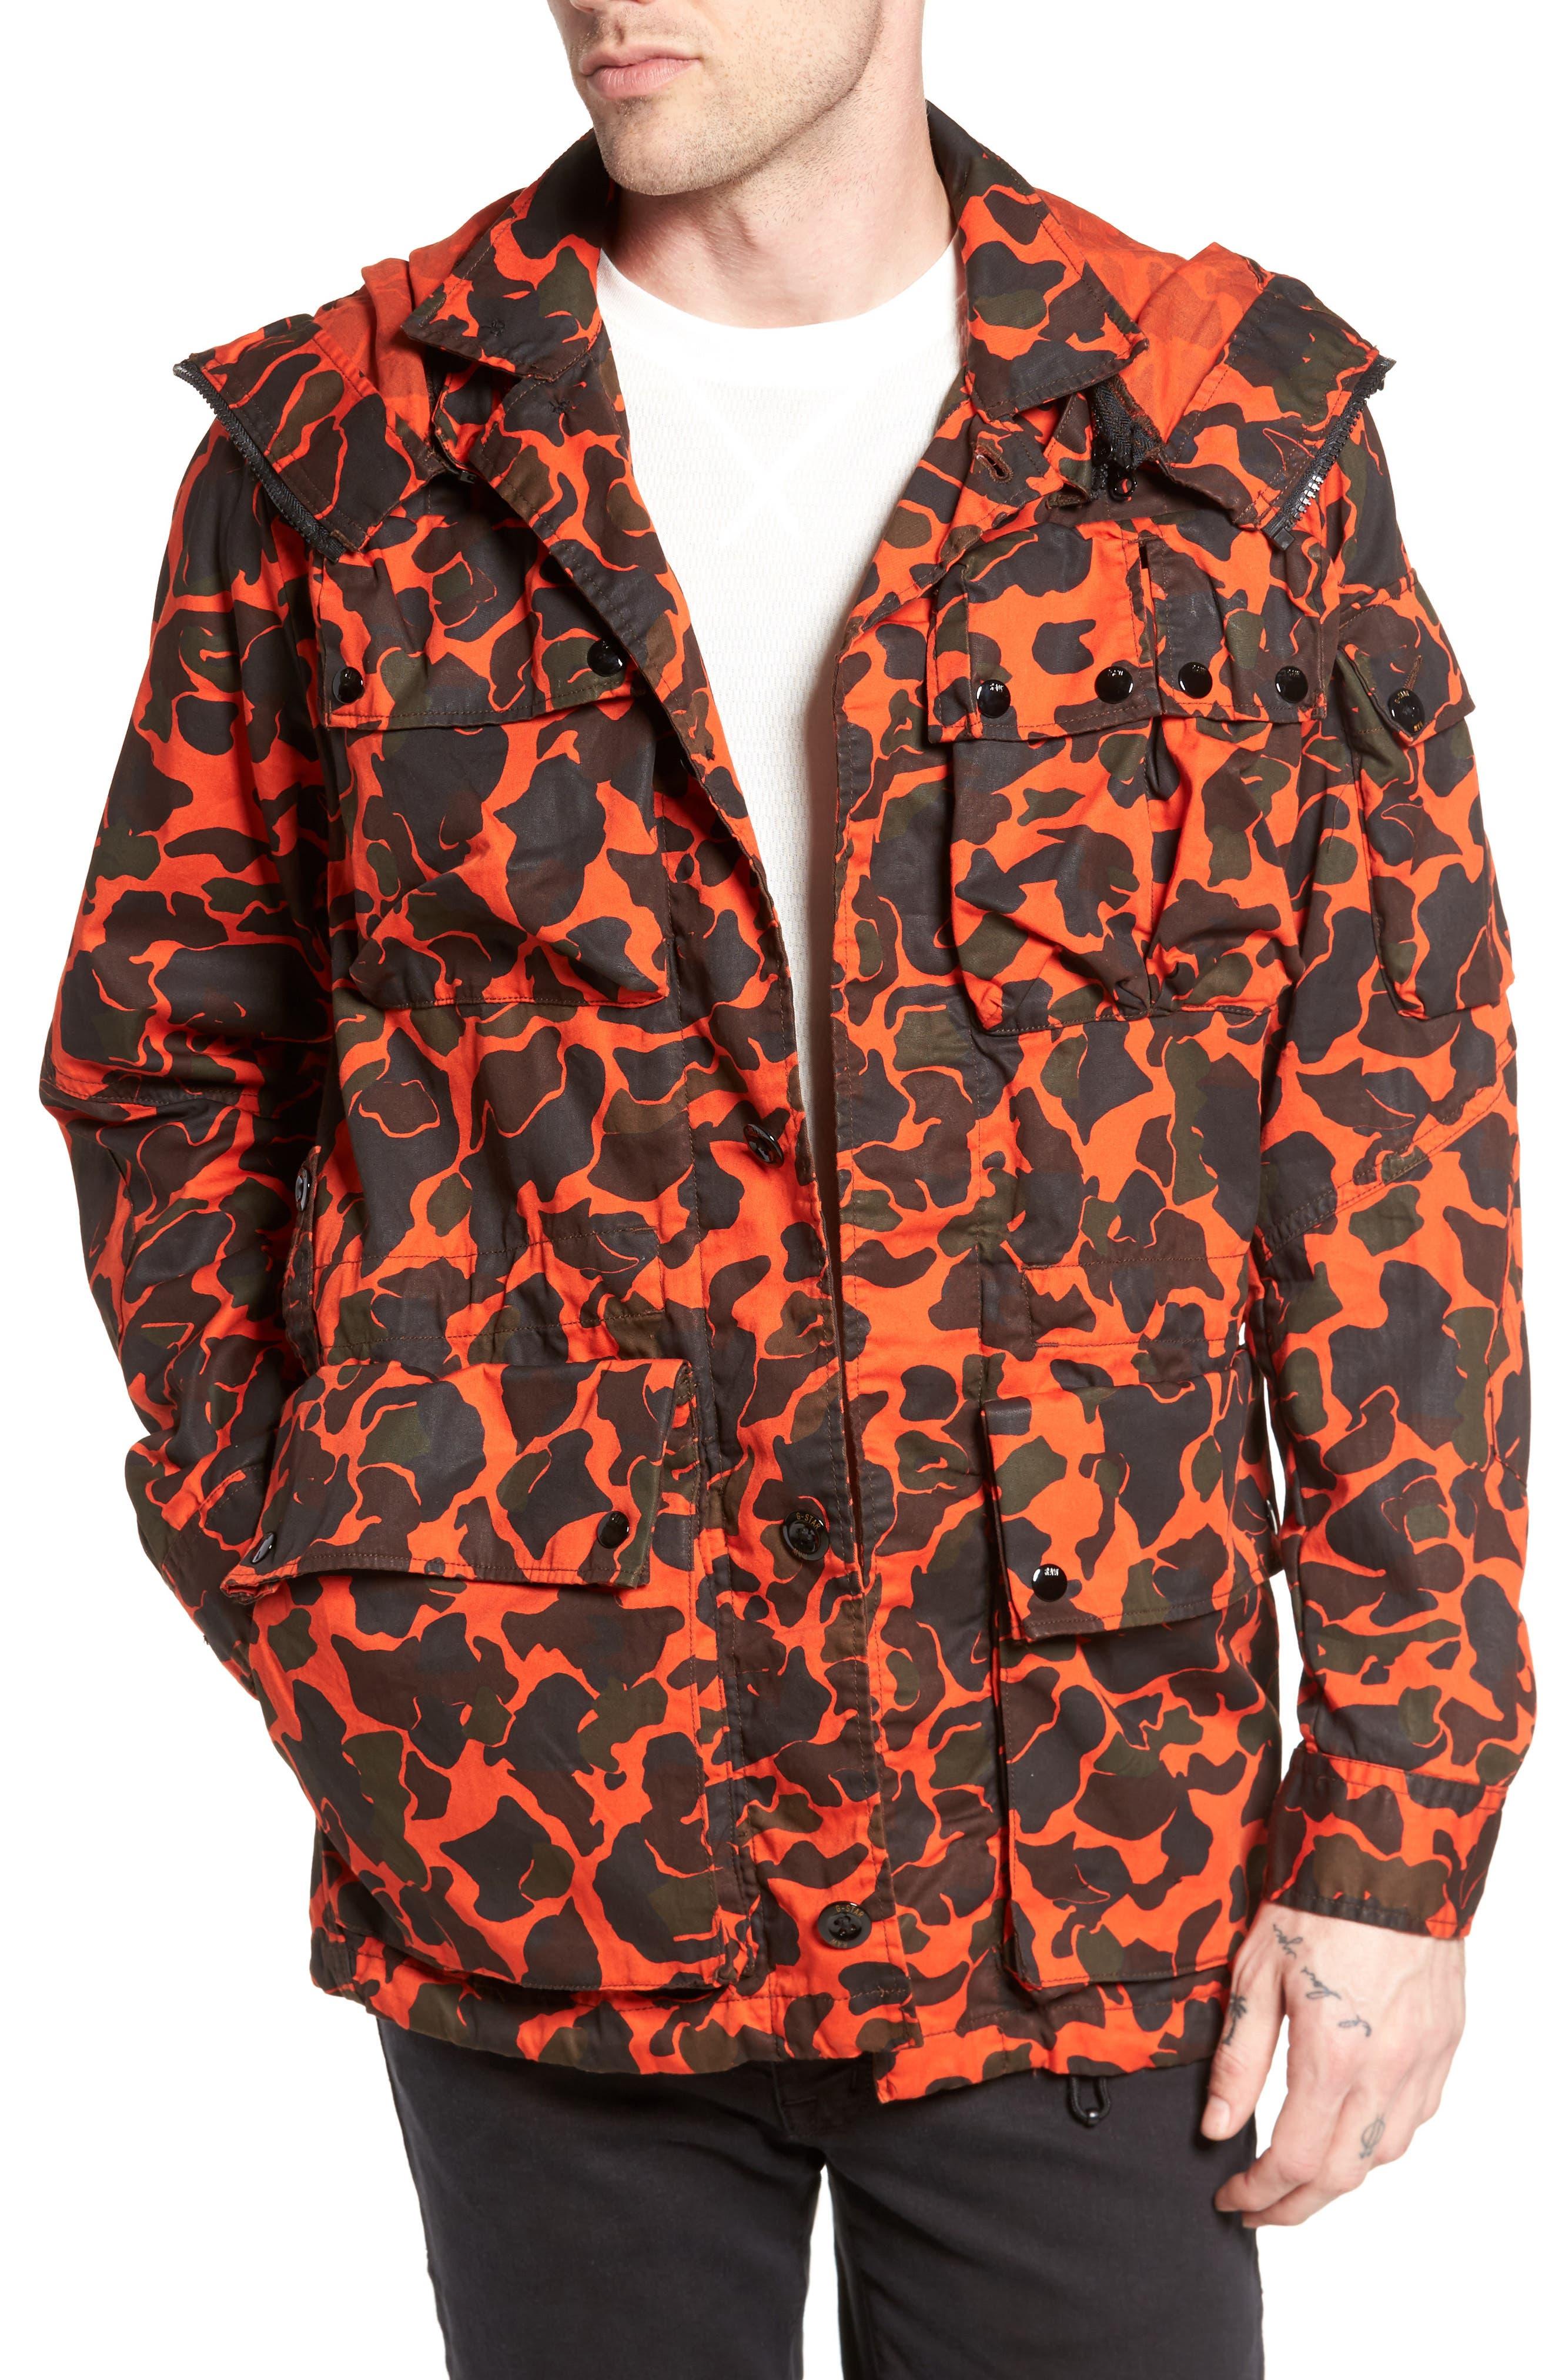 Ospak Submarine Hooded Jacket,                             Main thumbnail 1, color,                             800